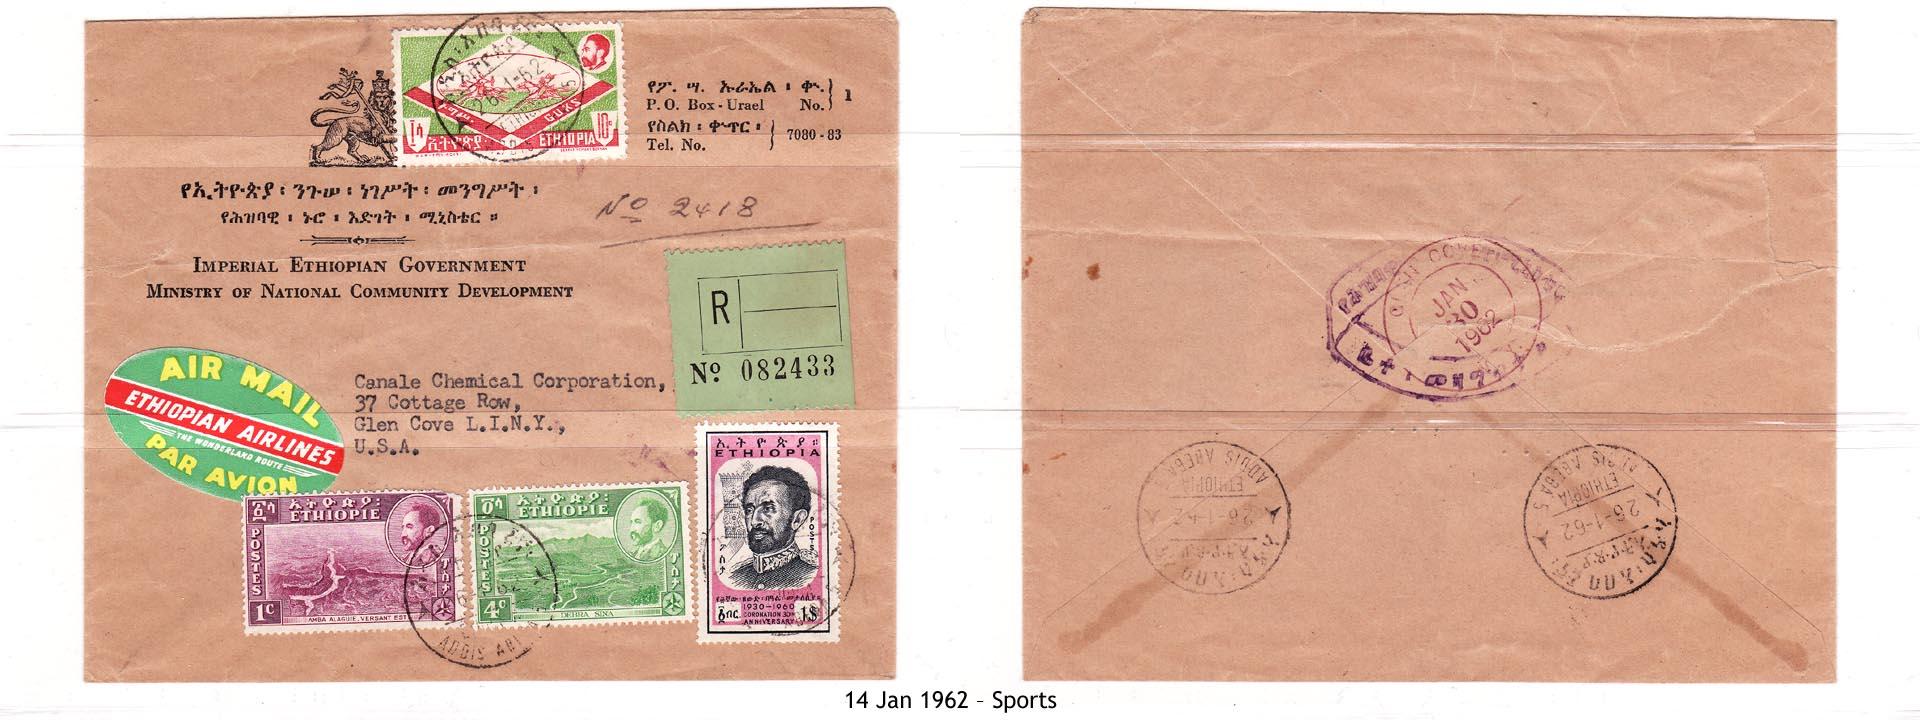 19620114 – Sports